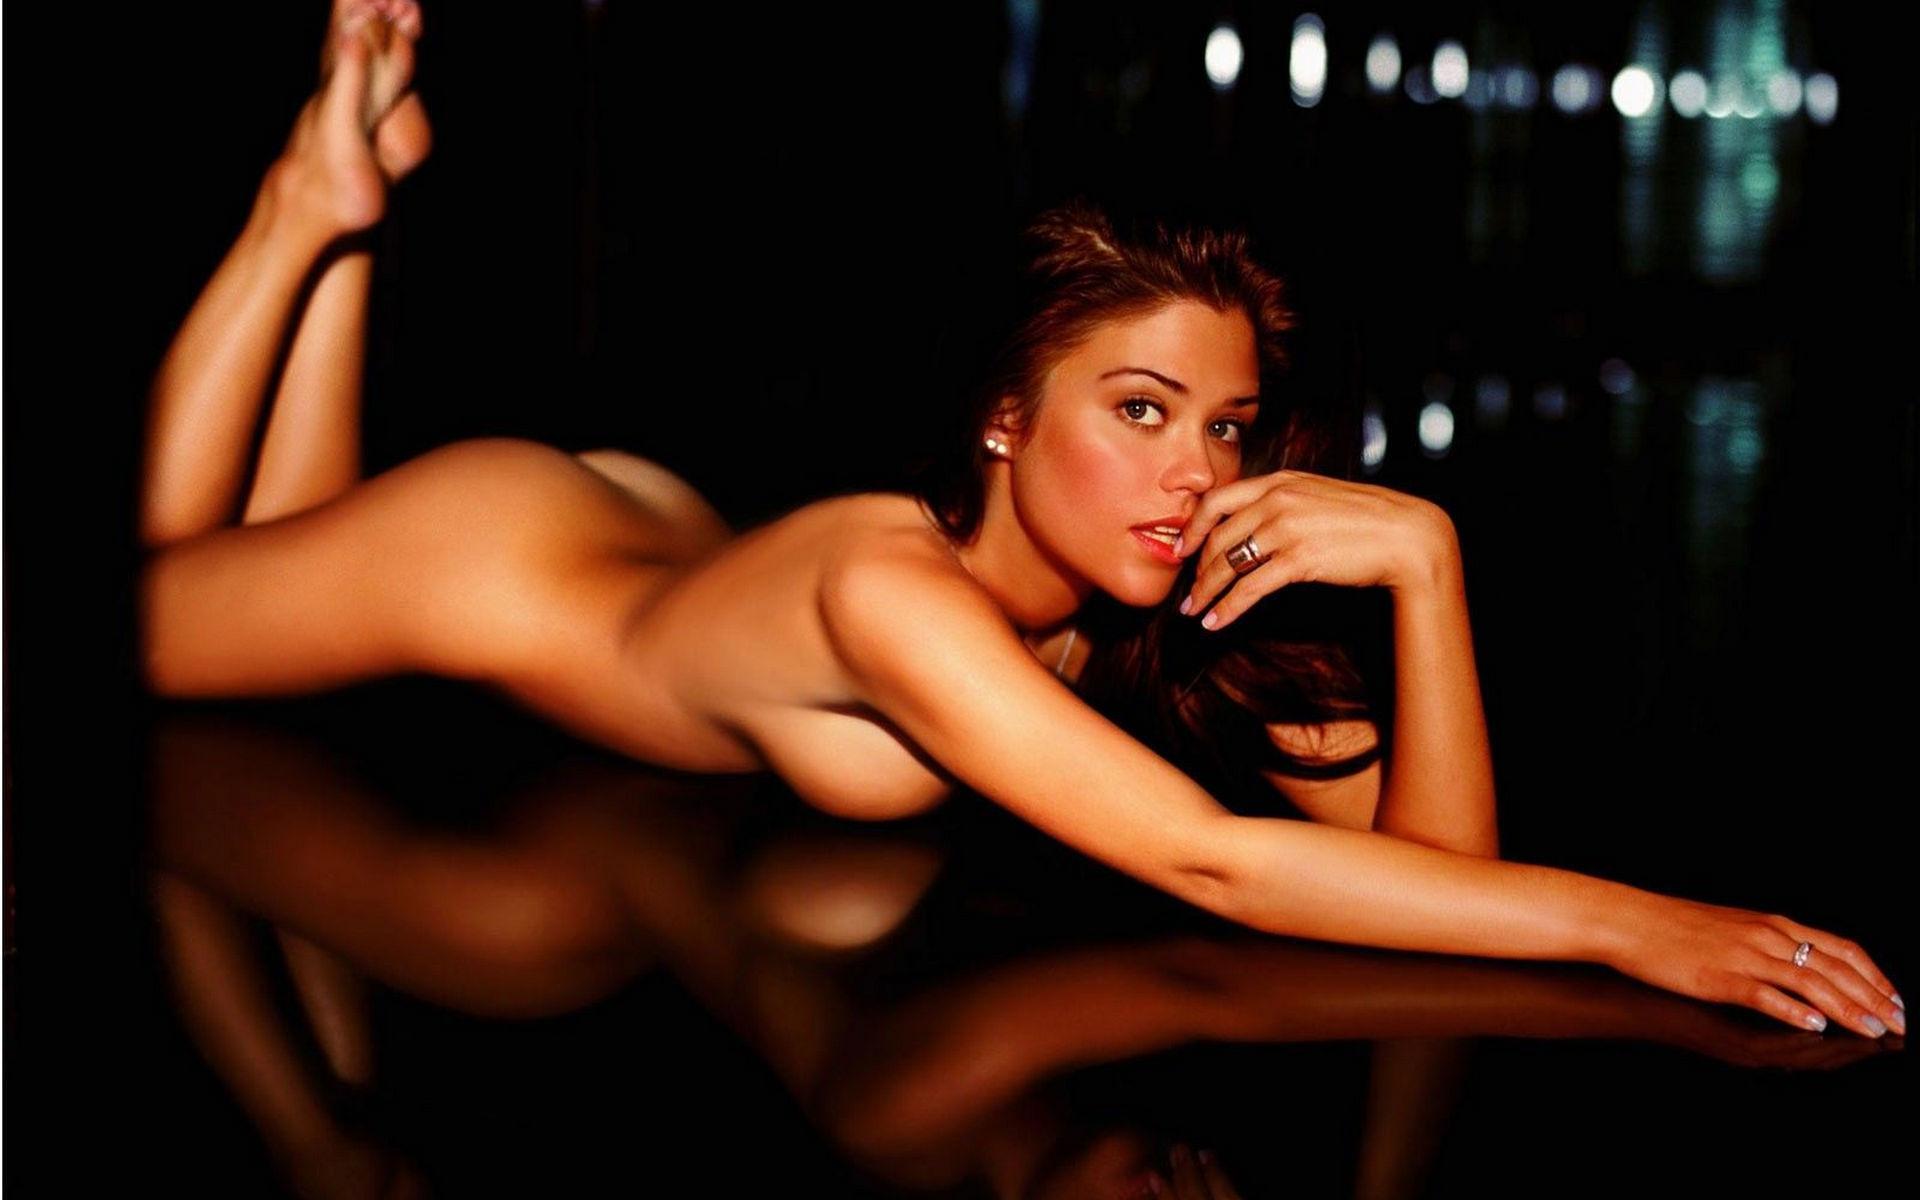 Susan moynahan naked